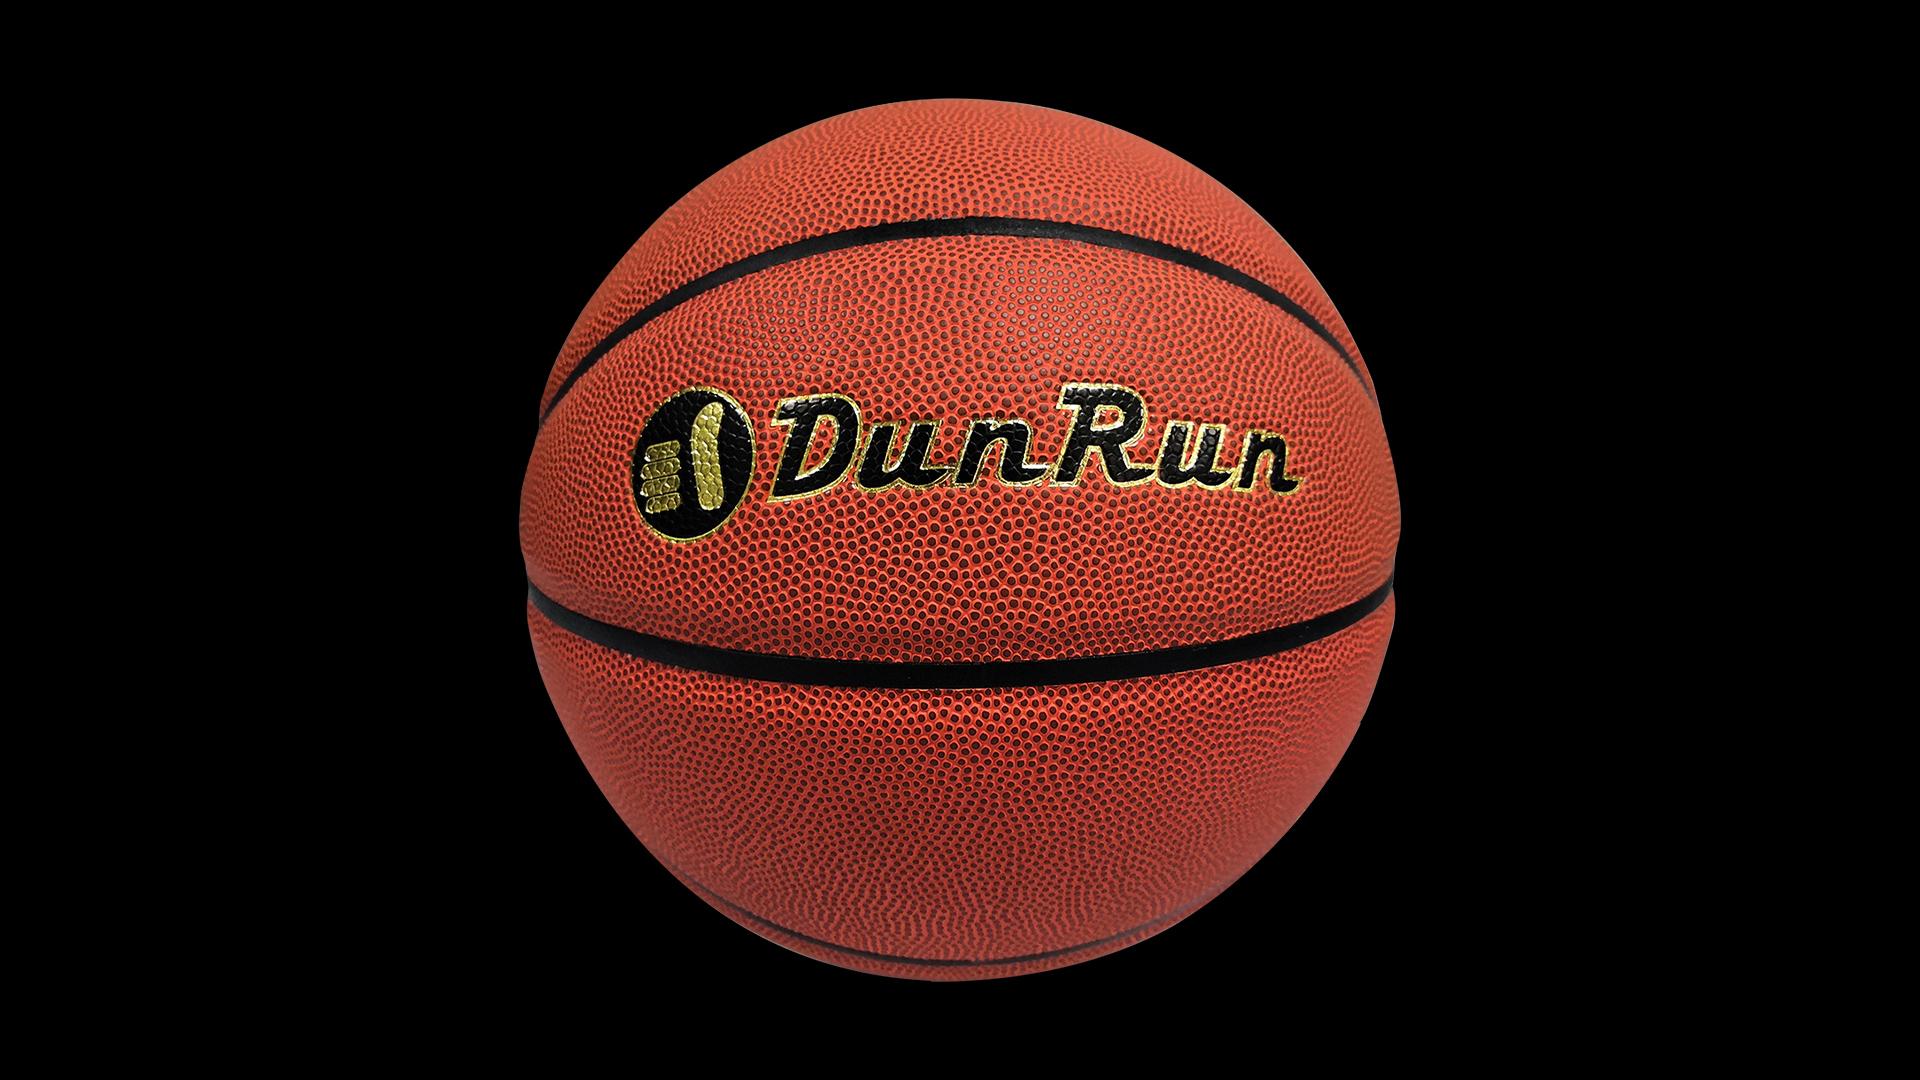 Custom High Elastic Composite Leather Basketballs